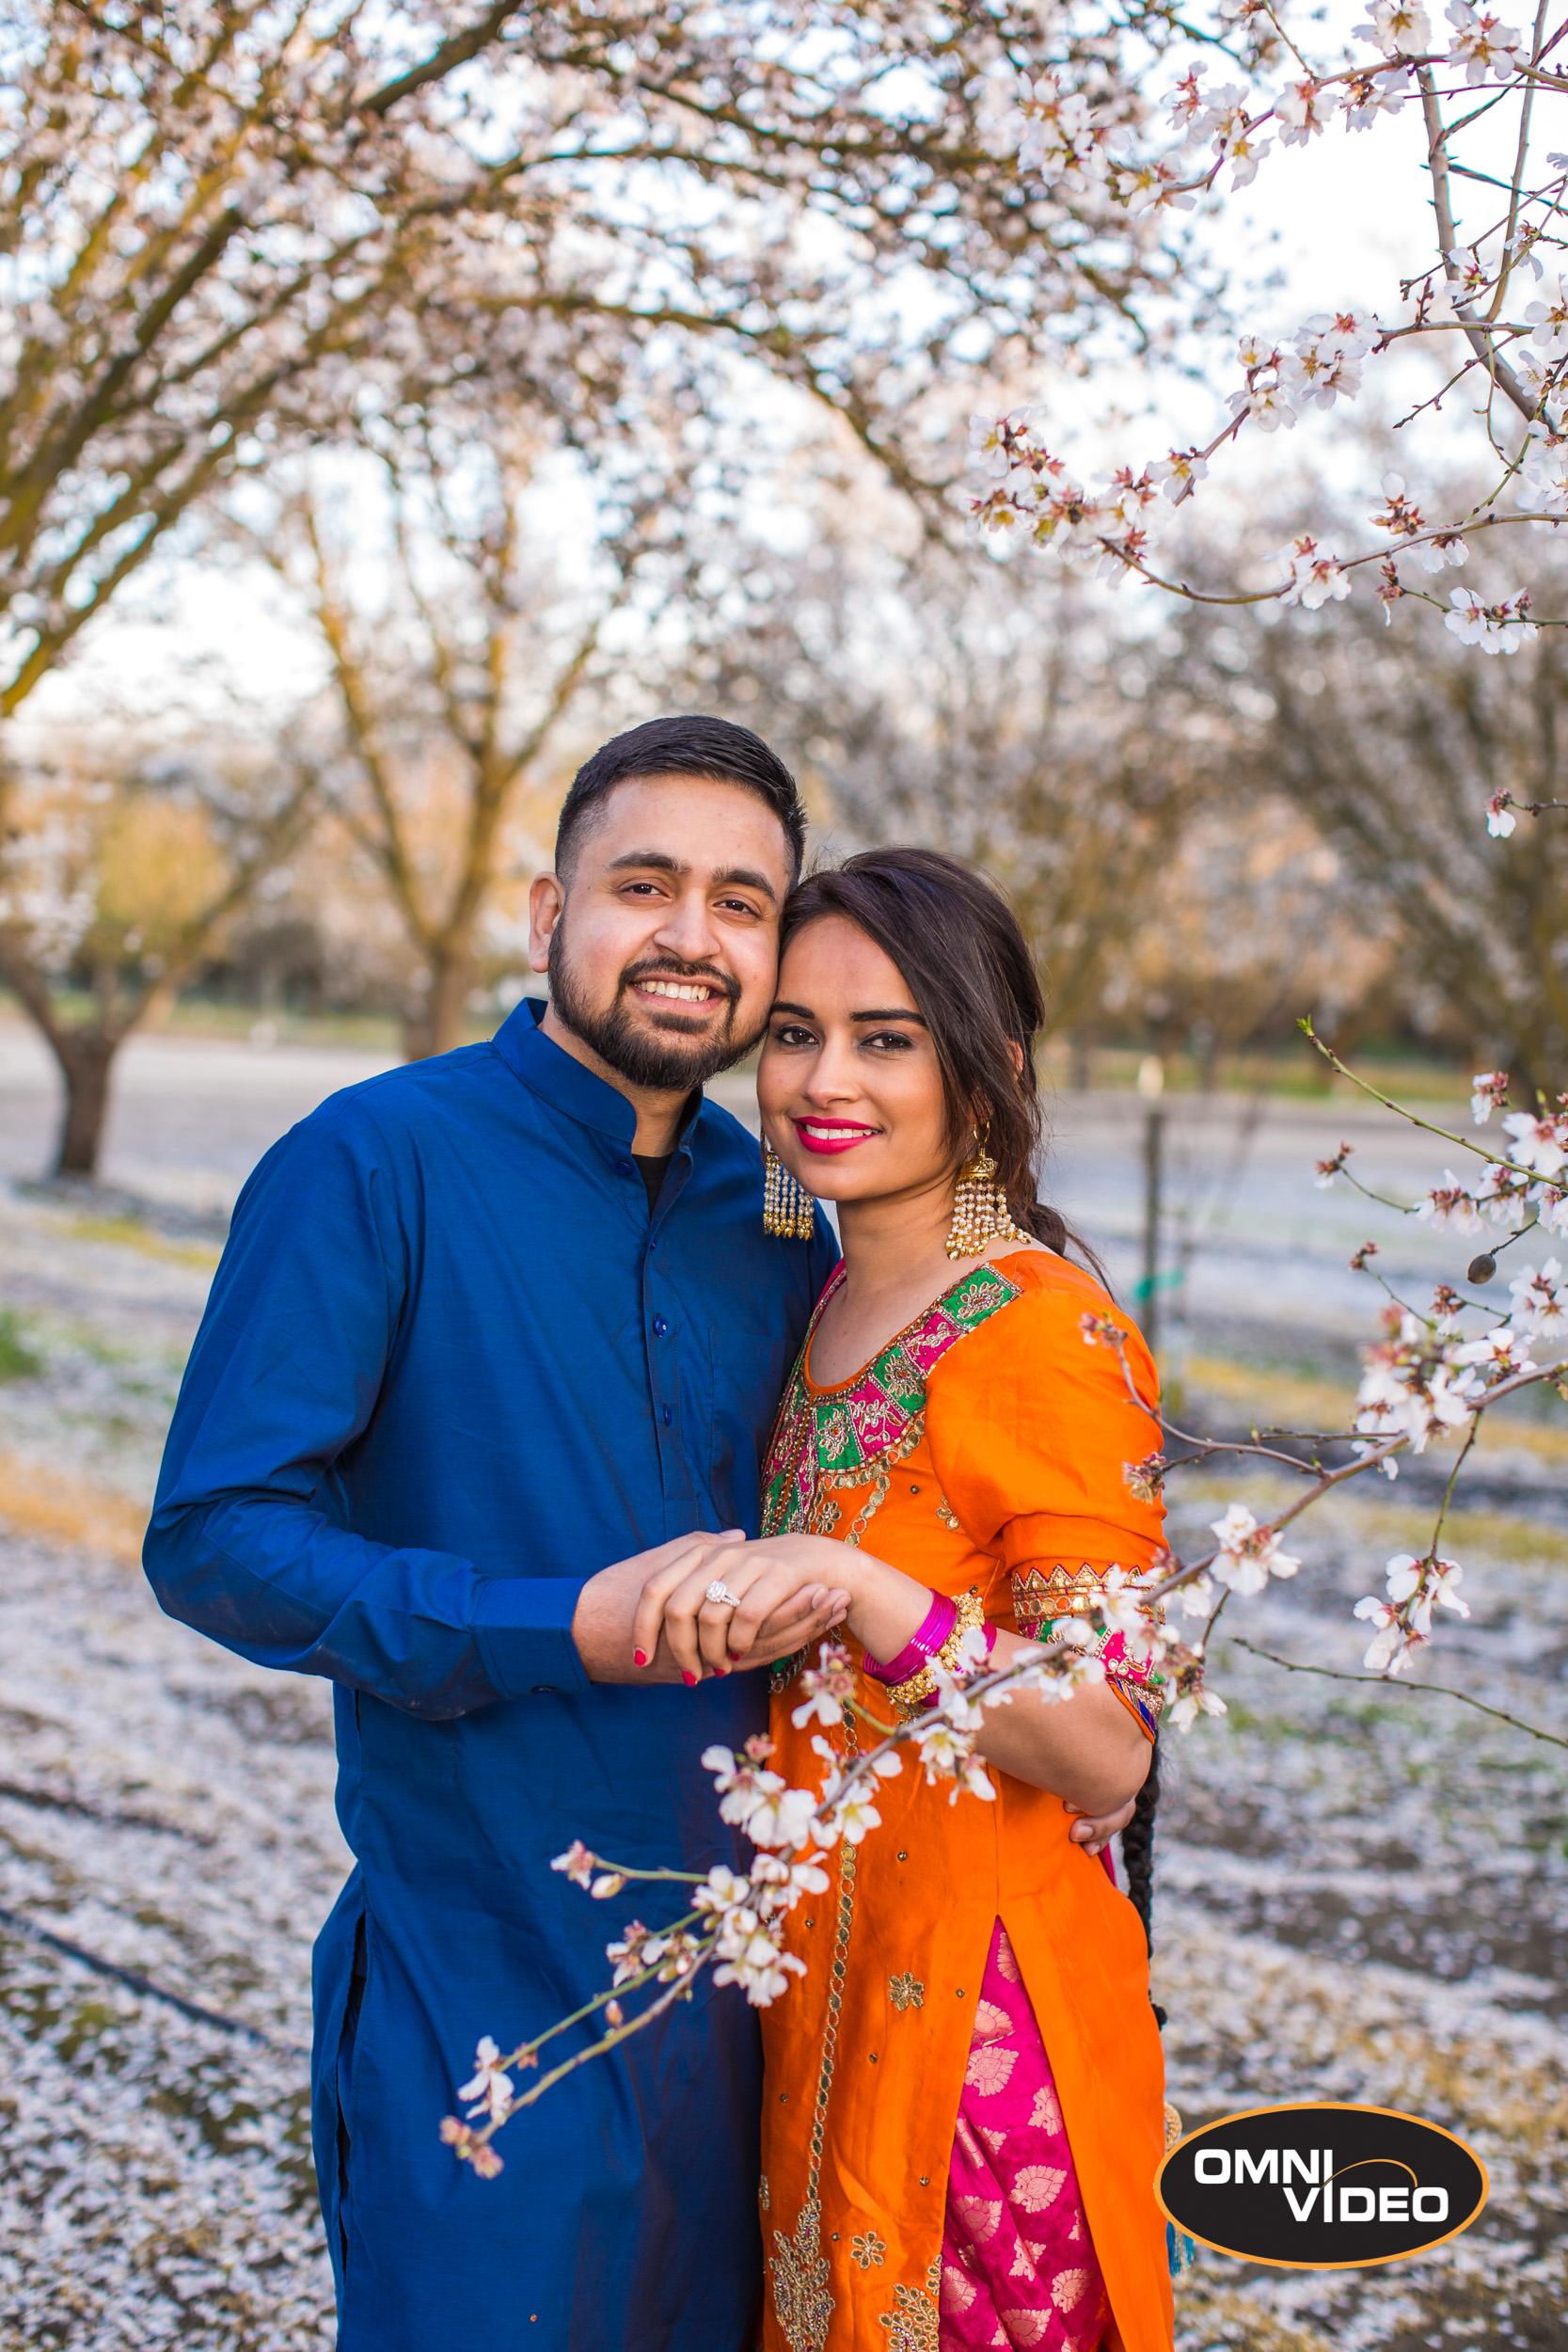 Sachdeep & Rupinder Engagement Photoshoot, Omni Video Blog